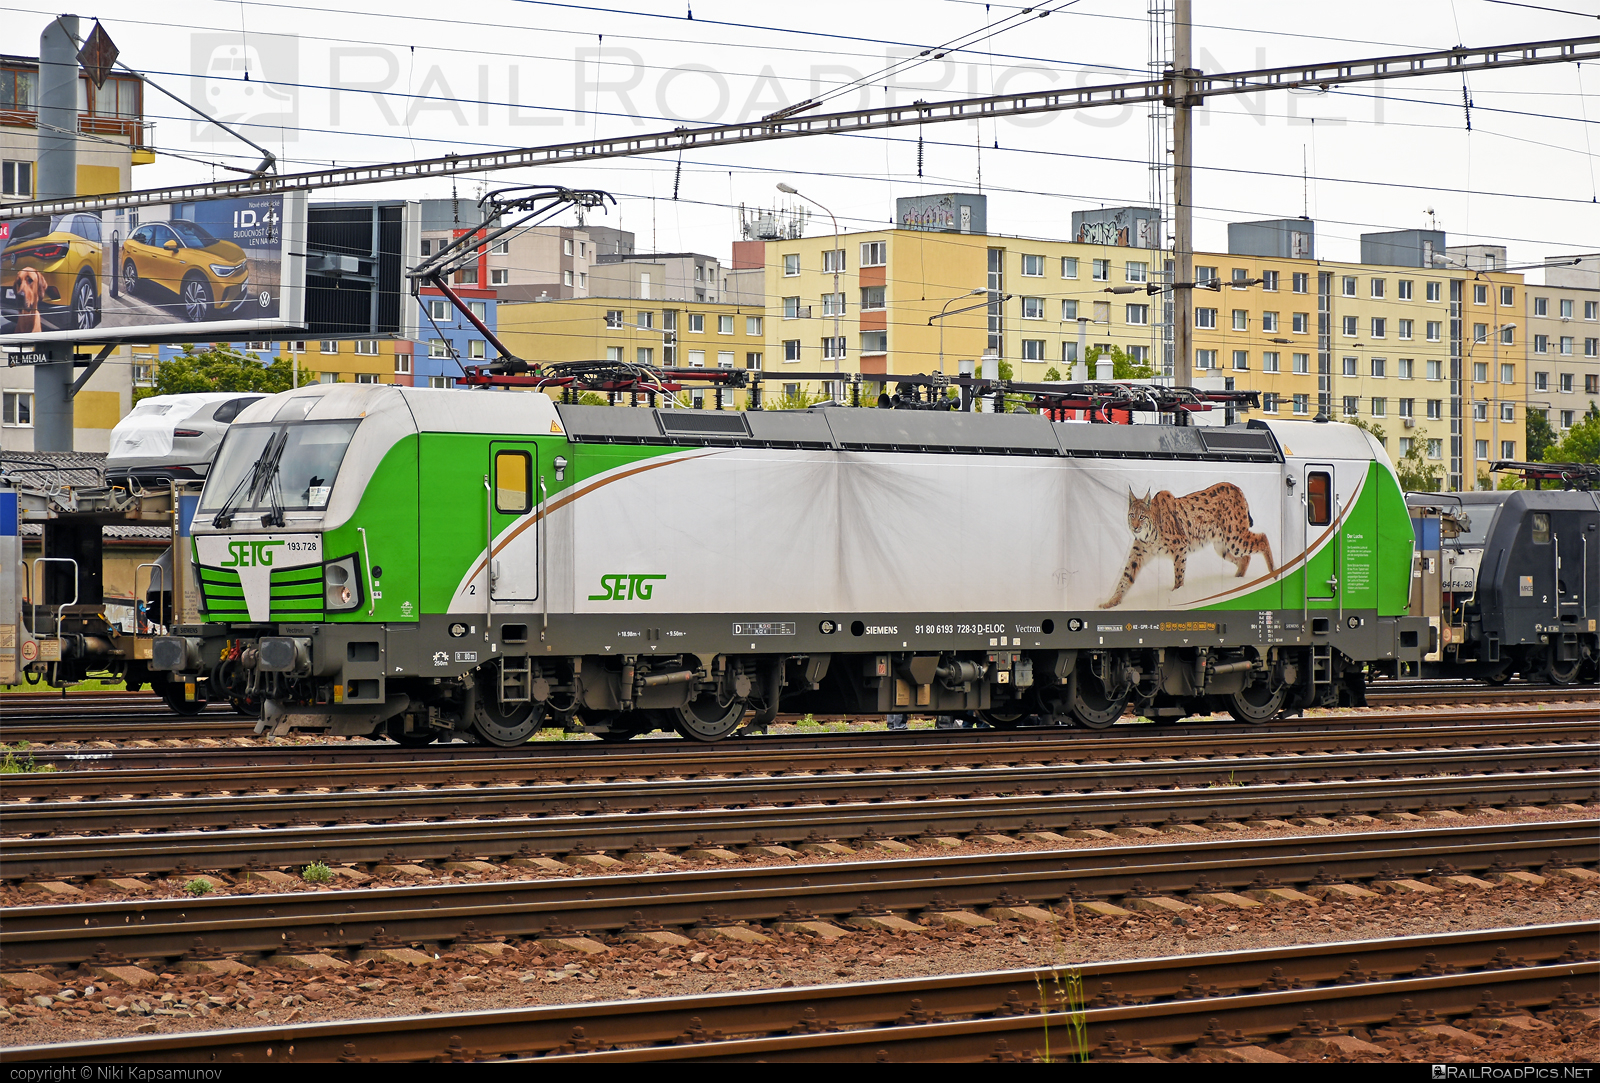 Siemens Vectron MS - 193 728 operated by Salzburger Eisenbahn Transportlogistik GmbH #SalzburgerEisenbahnTransportlogistik #SalzburgerEisenbahnTransportlogistikGmbH #ell #ellgermany #eloc #europeanlocomotiveleasing #setg #siemens #siemensvectron #siemensvectronms #vectron #vectronms